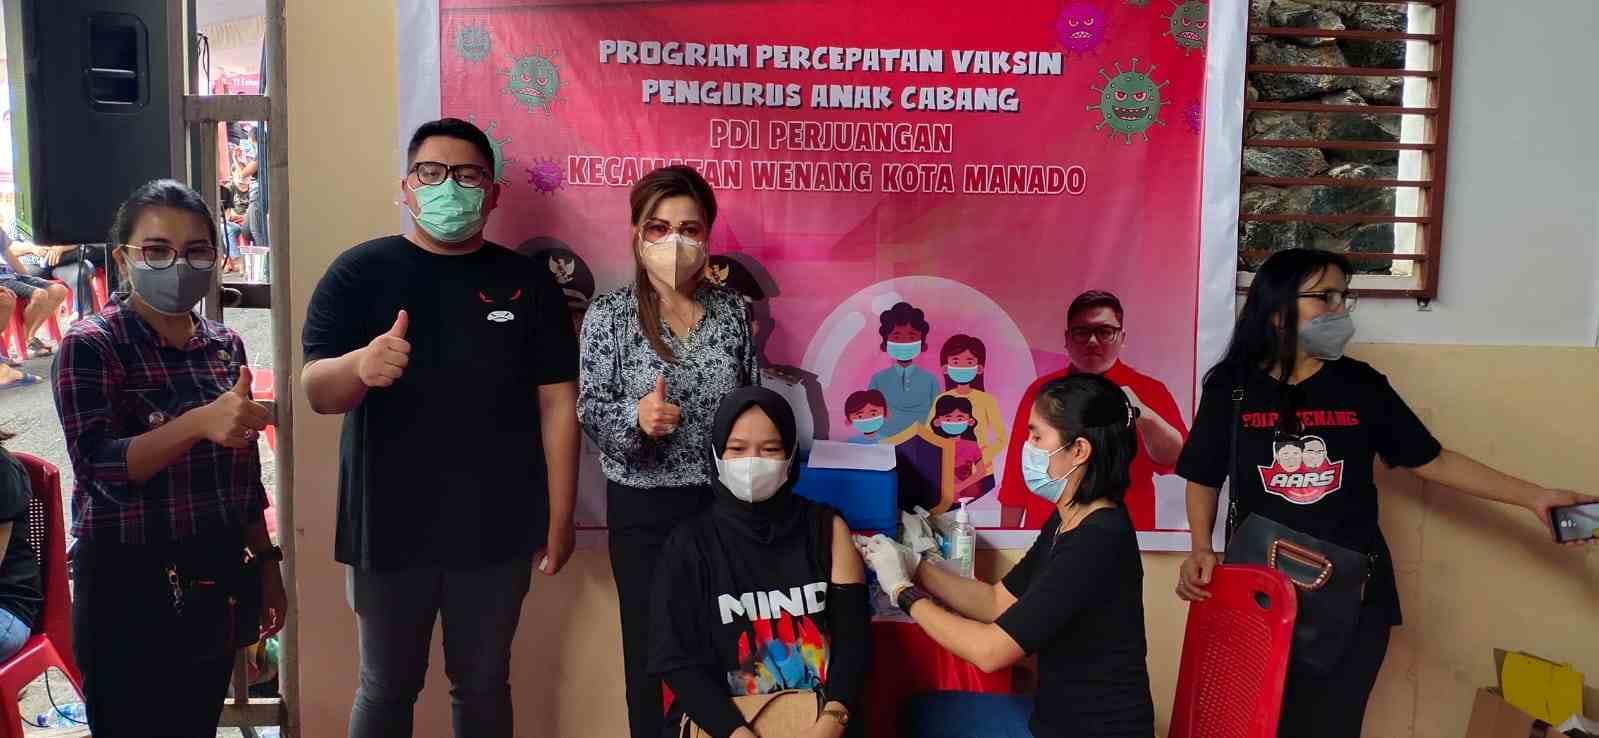 Tinjau Vaksinasi PAC Wenang, Irene Ajak Warga Tuntaskan Seluruh Tahapan Vaksinasi